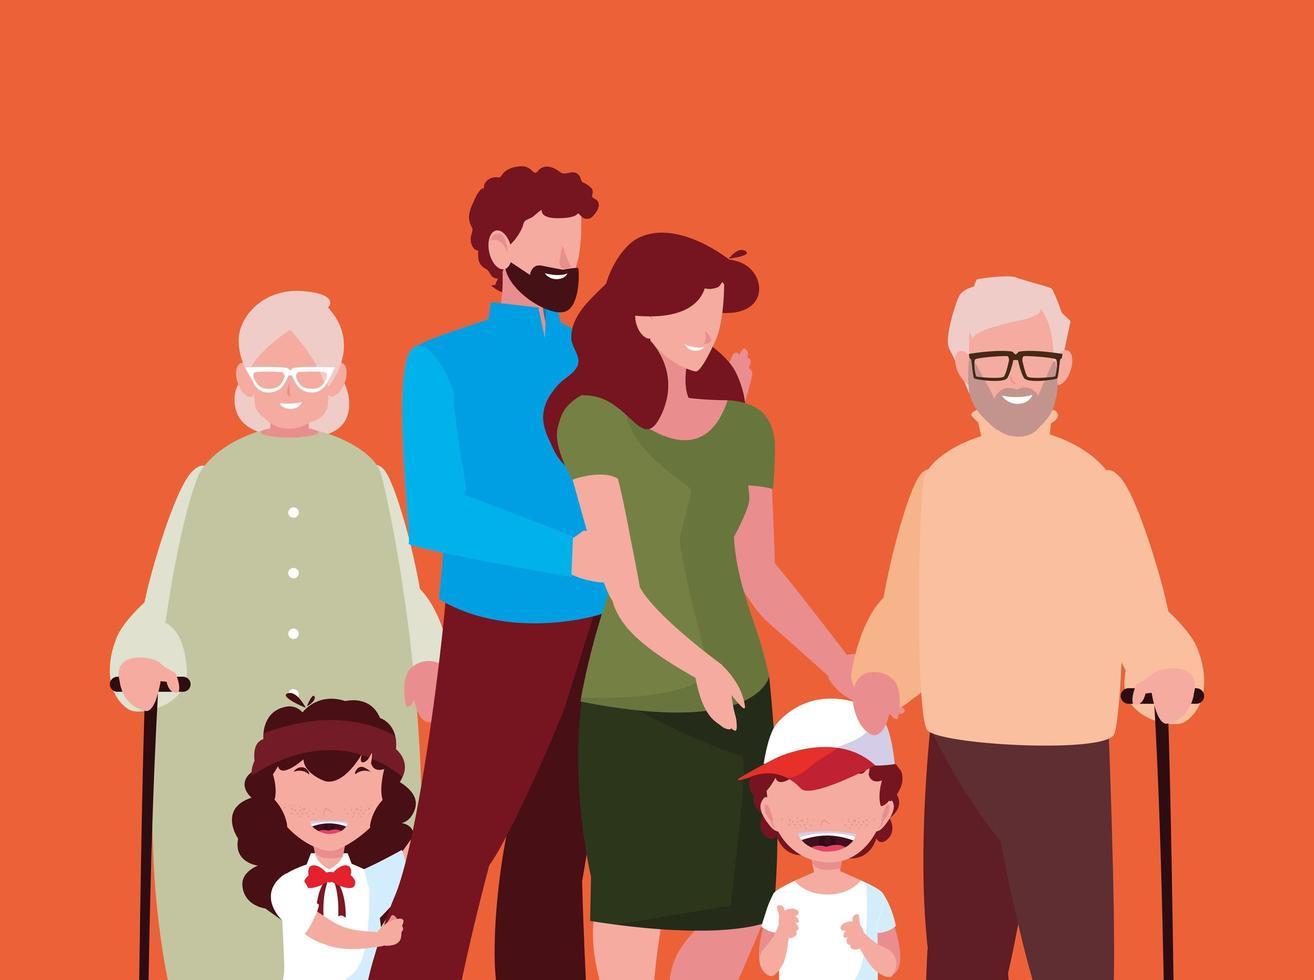 Family members characters  vector